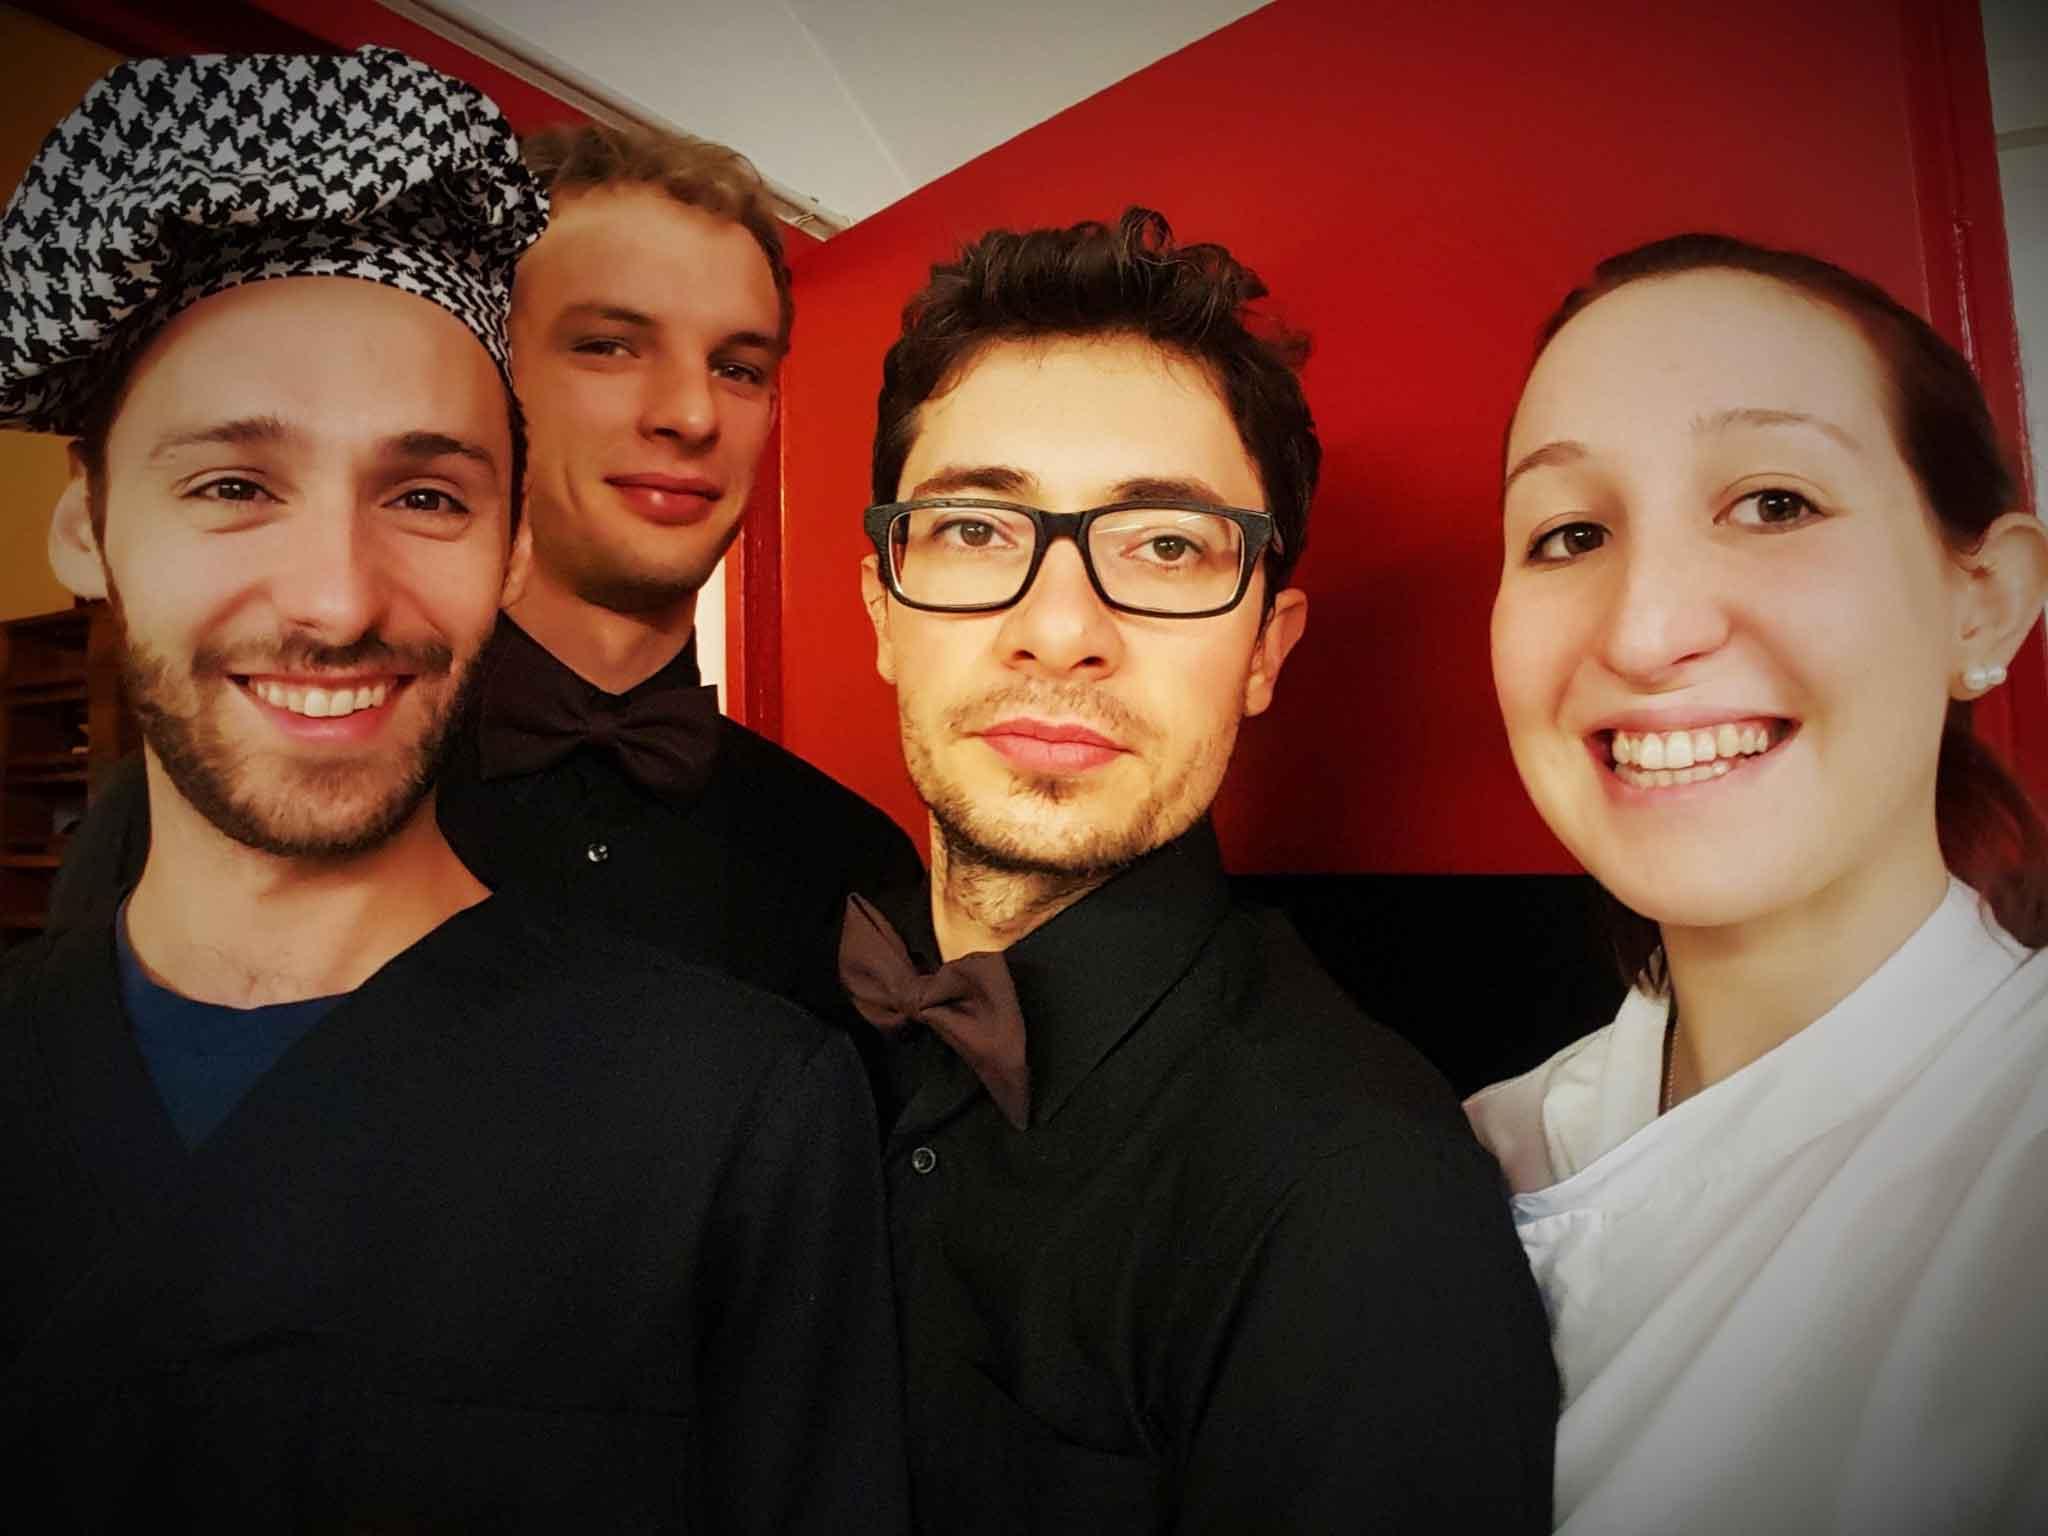 ristorante-badesse-casalgrande-staff